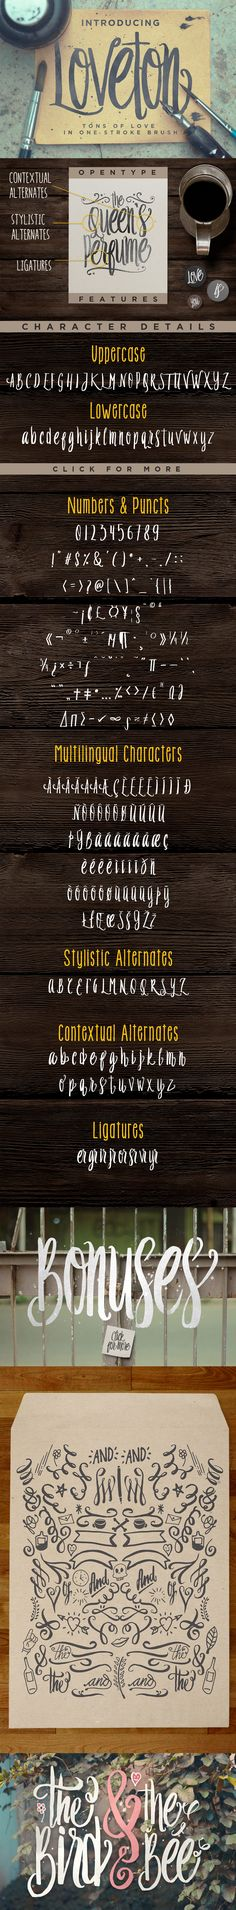 Loveton Typeface Font by Irwanismoyo | 22 Professional & Artistic Fonts Apr…